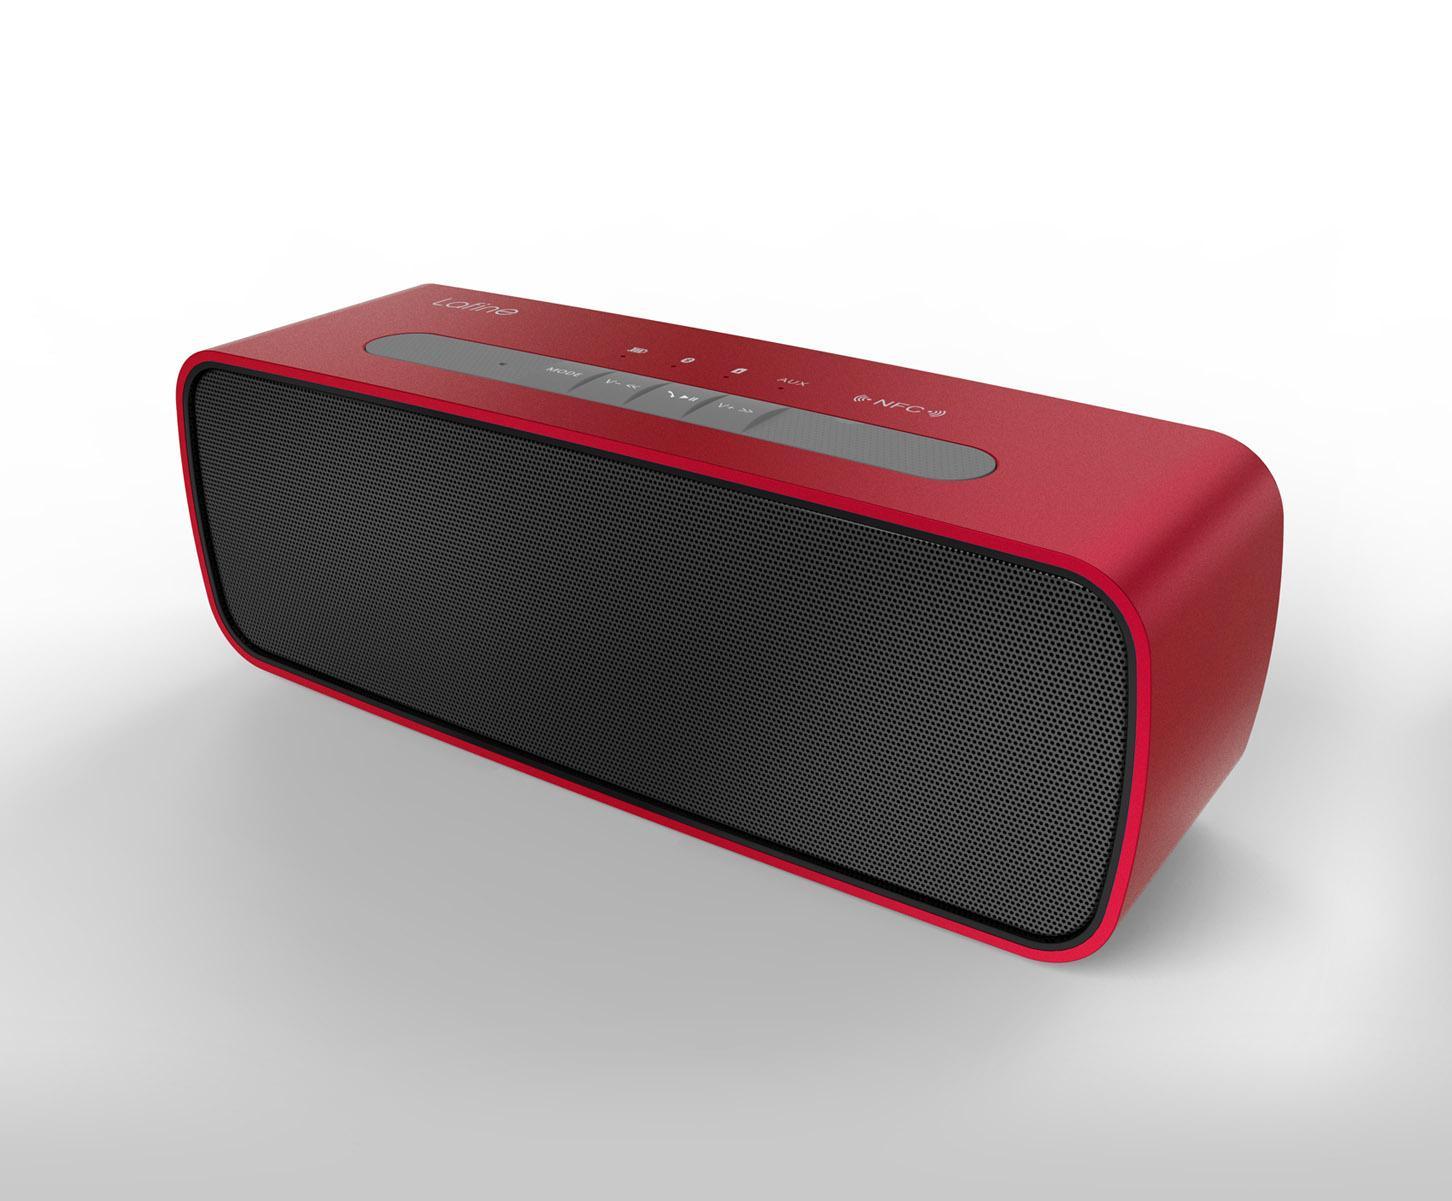 lafine f19 cd quality bluetooth speaker 360 degree surround voice portable bluetooth audio. Black Bedroom Furniture Sets. Home Design Ideas